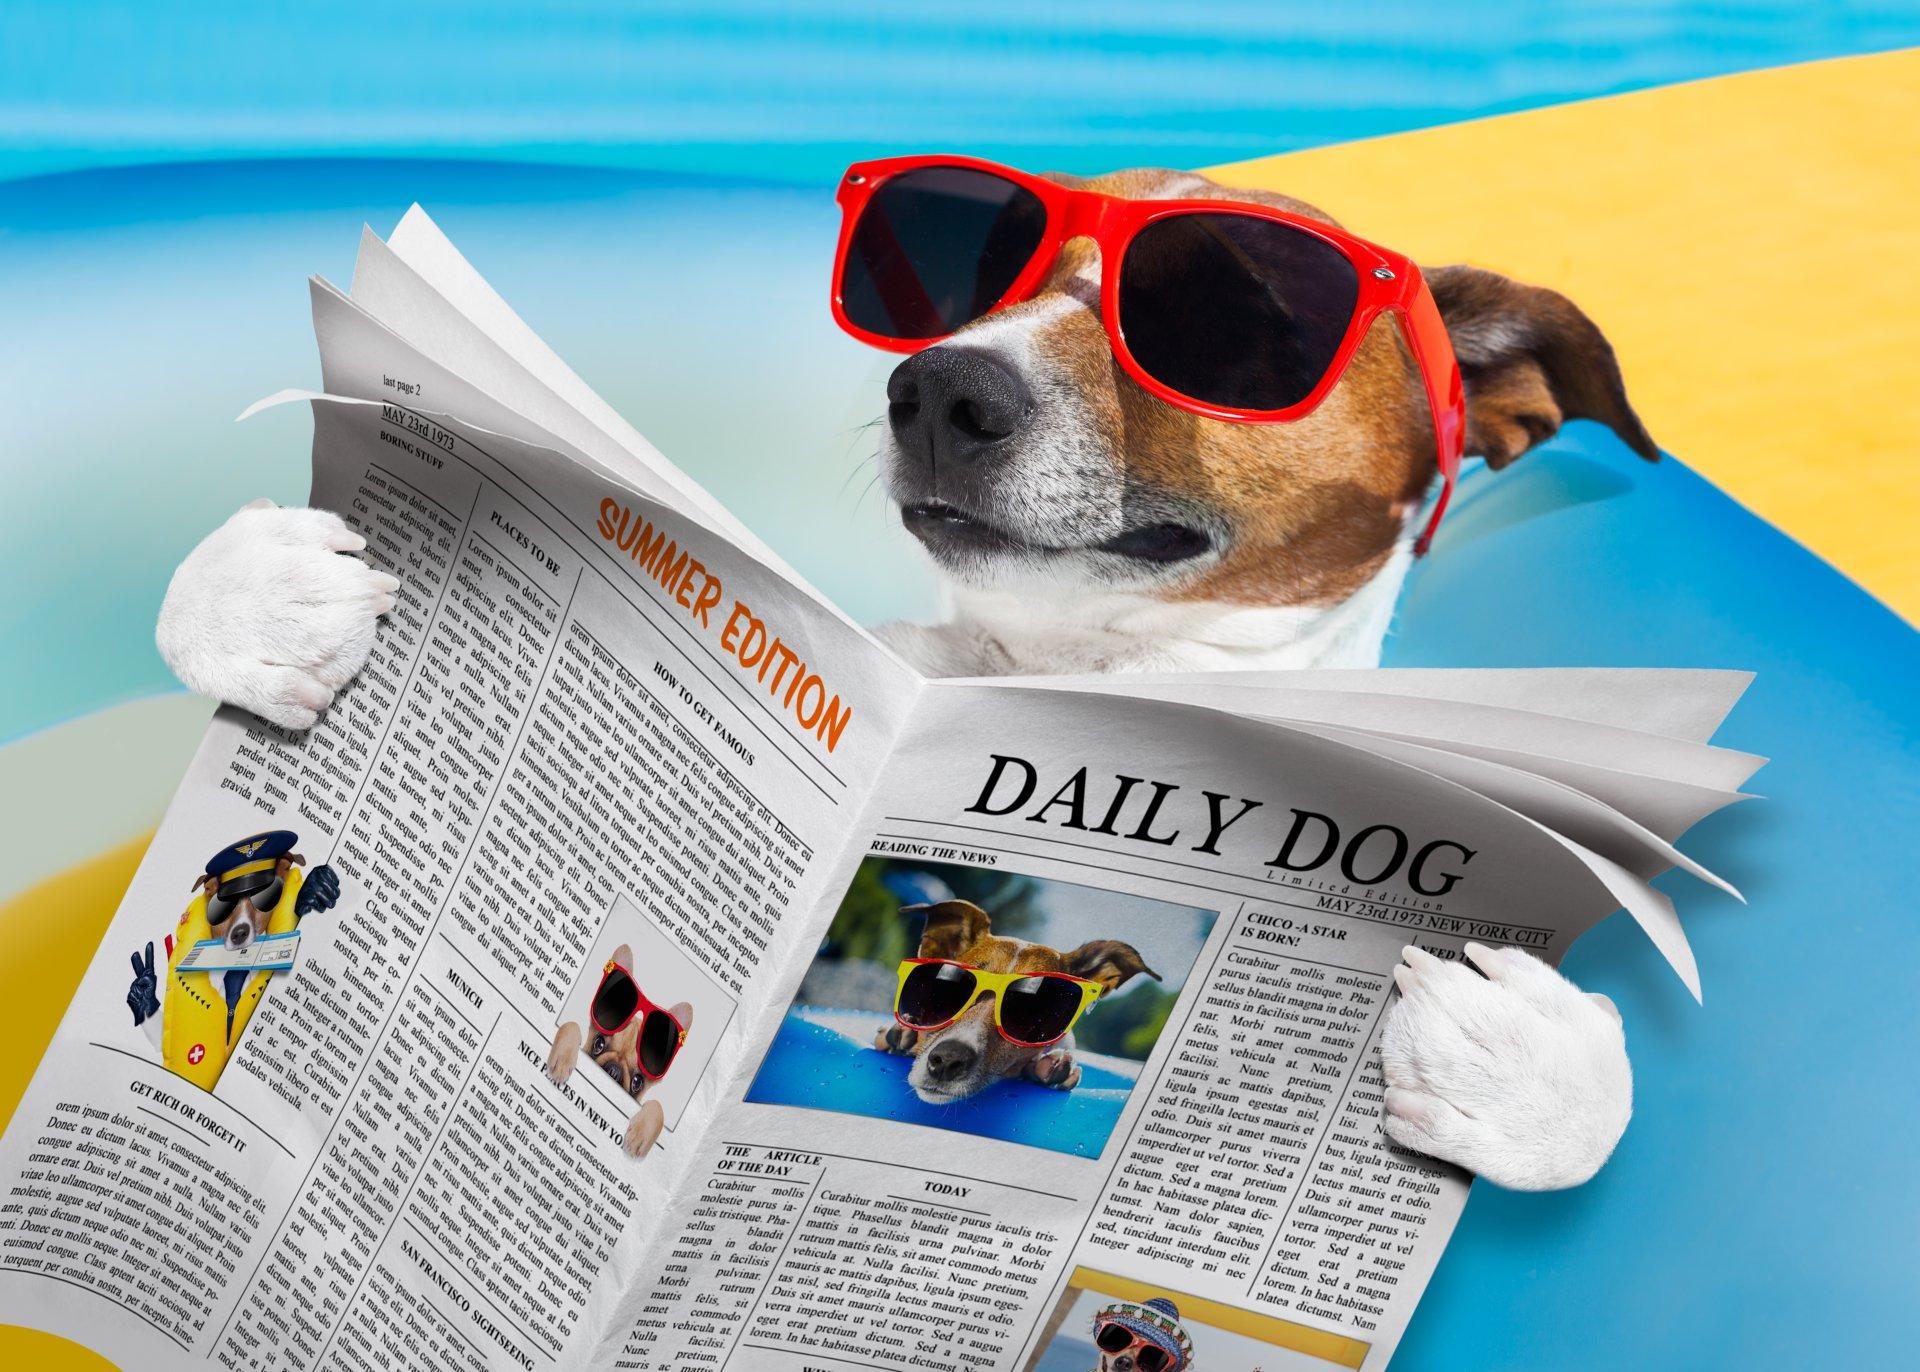 Dog 5k Retina Ultra HD Wallpaper Background Image